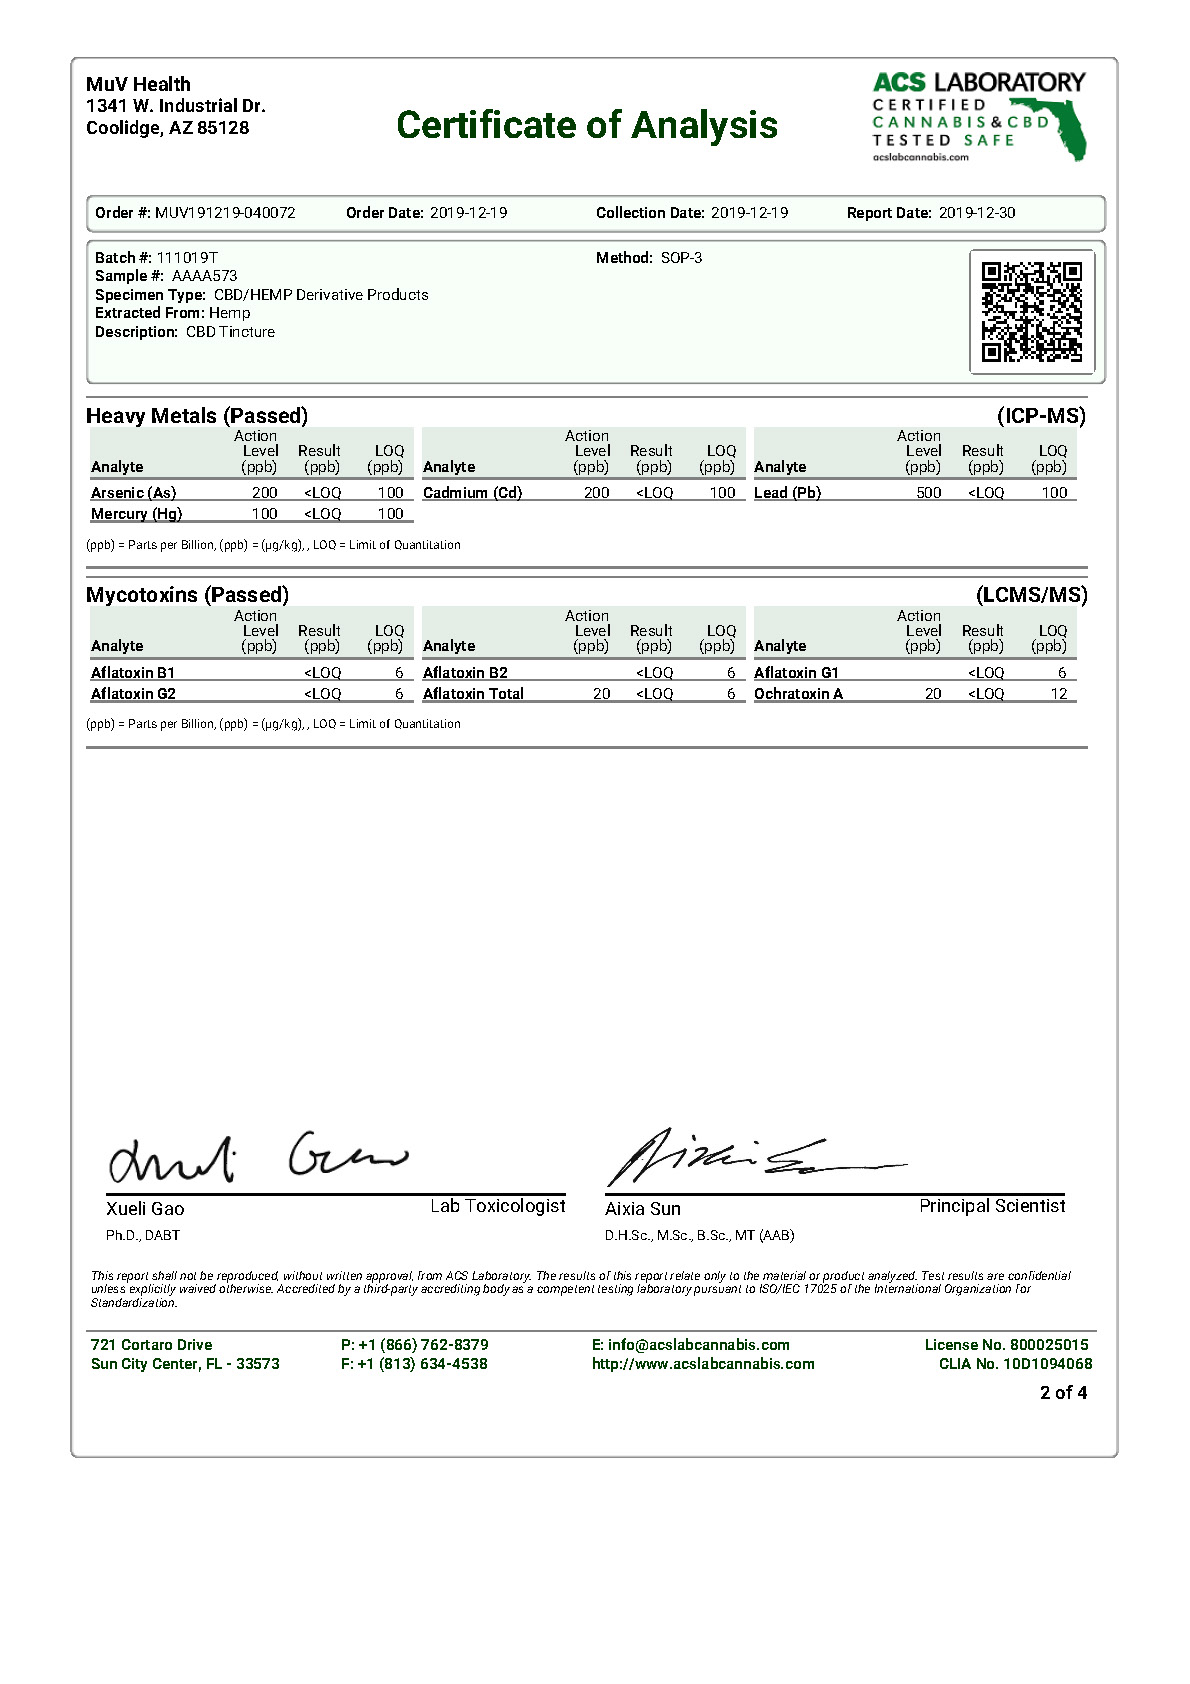 muv-cbd-tincture-coa-111019t-page-2.jpg